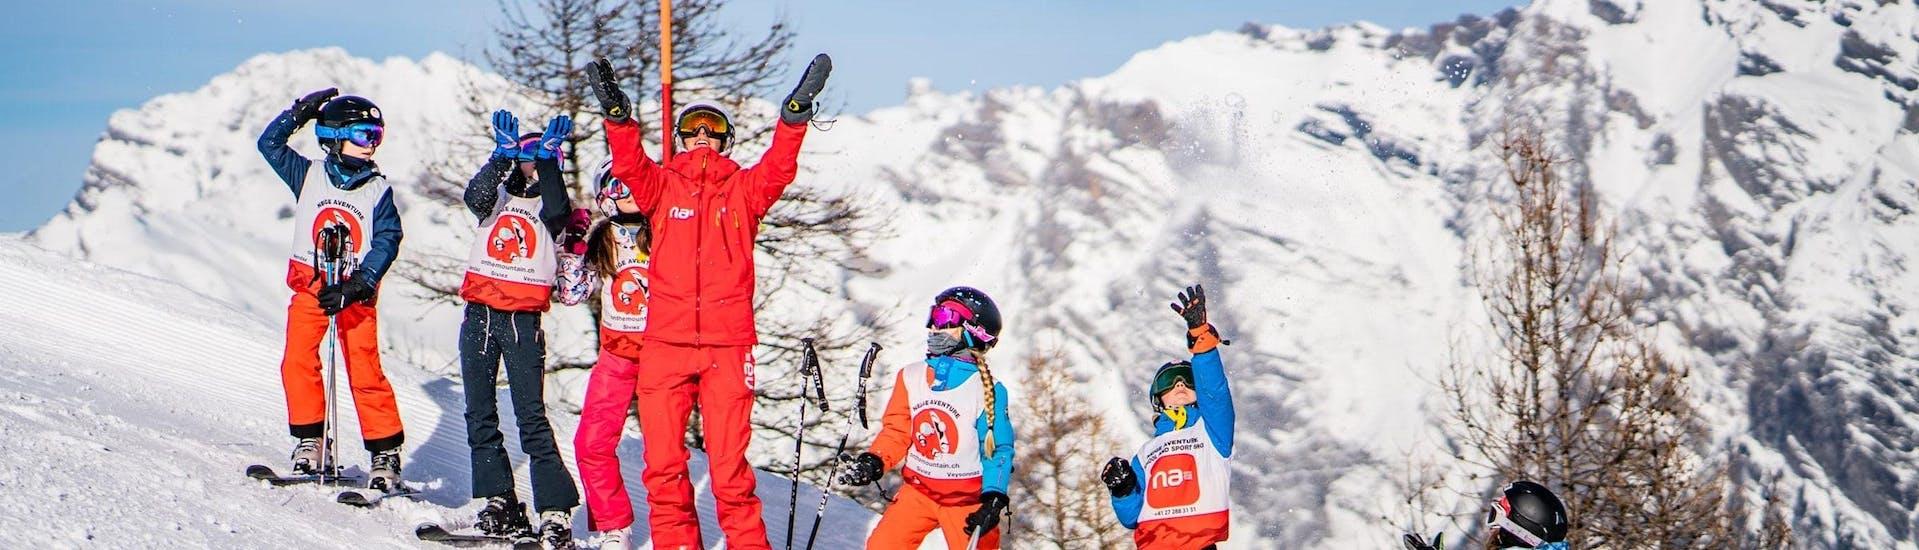 kids-ski-lessons-5-12-y-veysonnaz-neige-aventure-hero